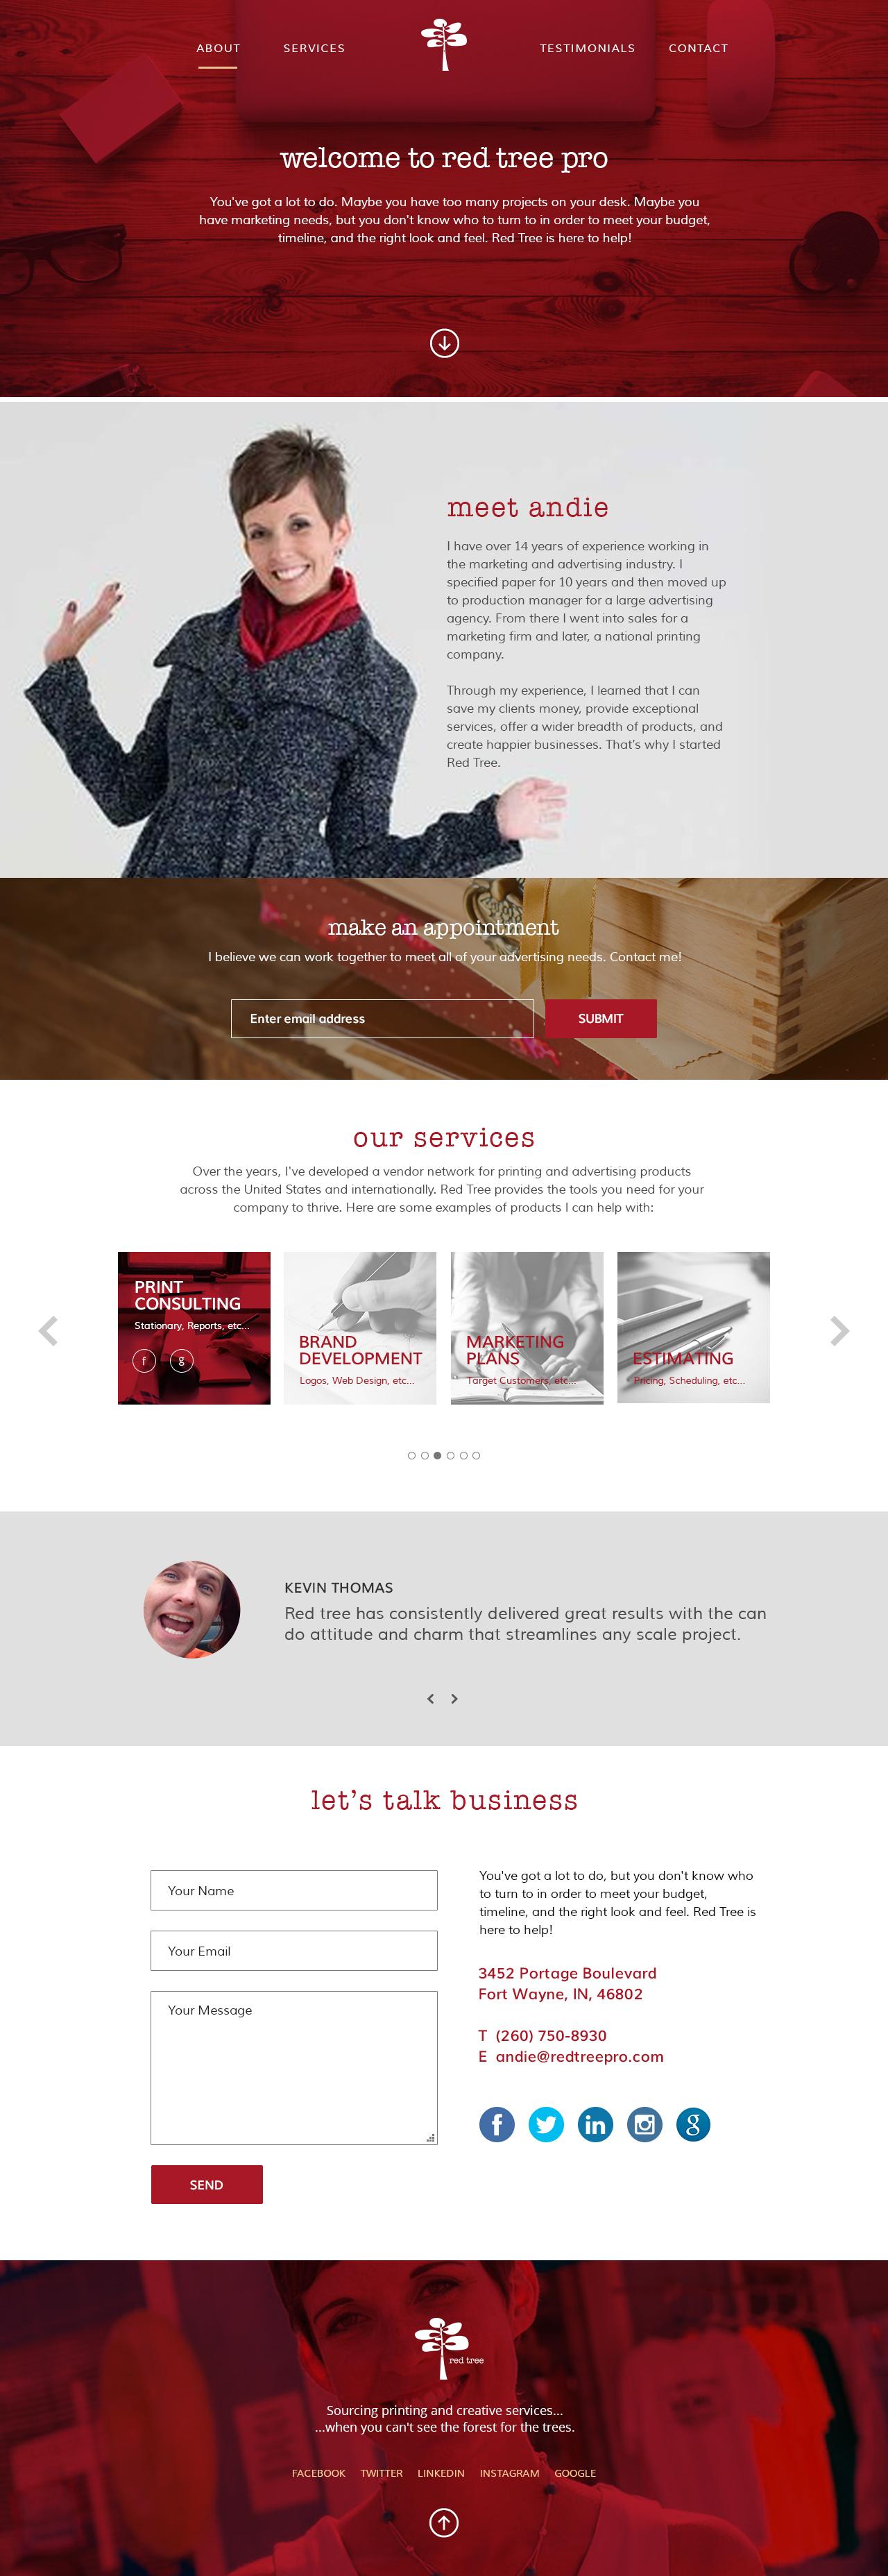 Redtreepro homepage full